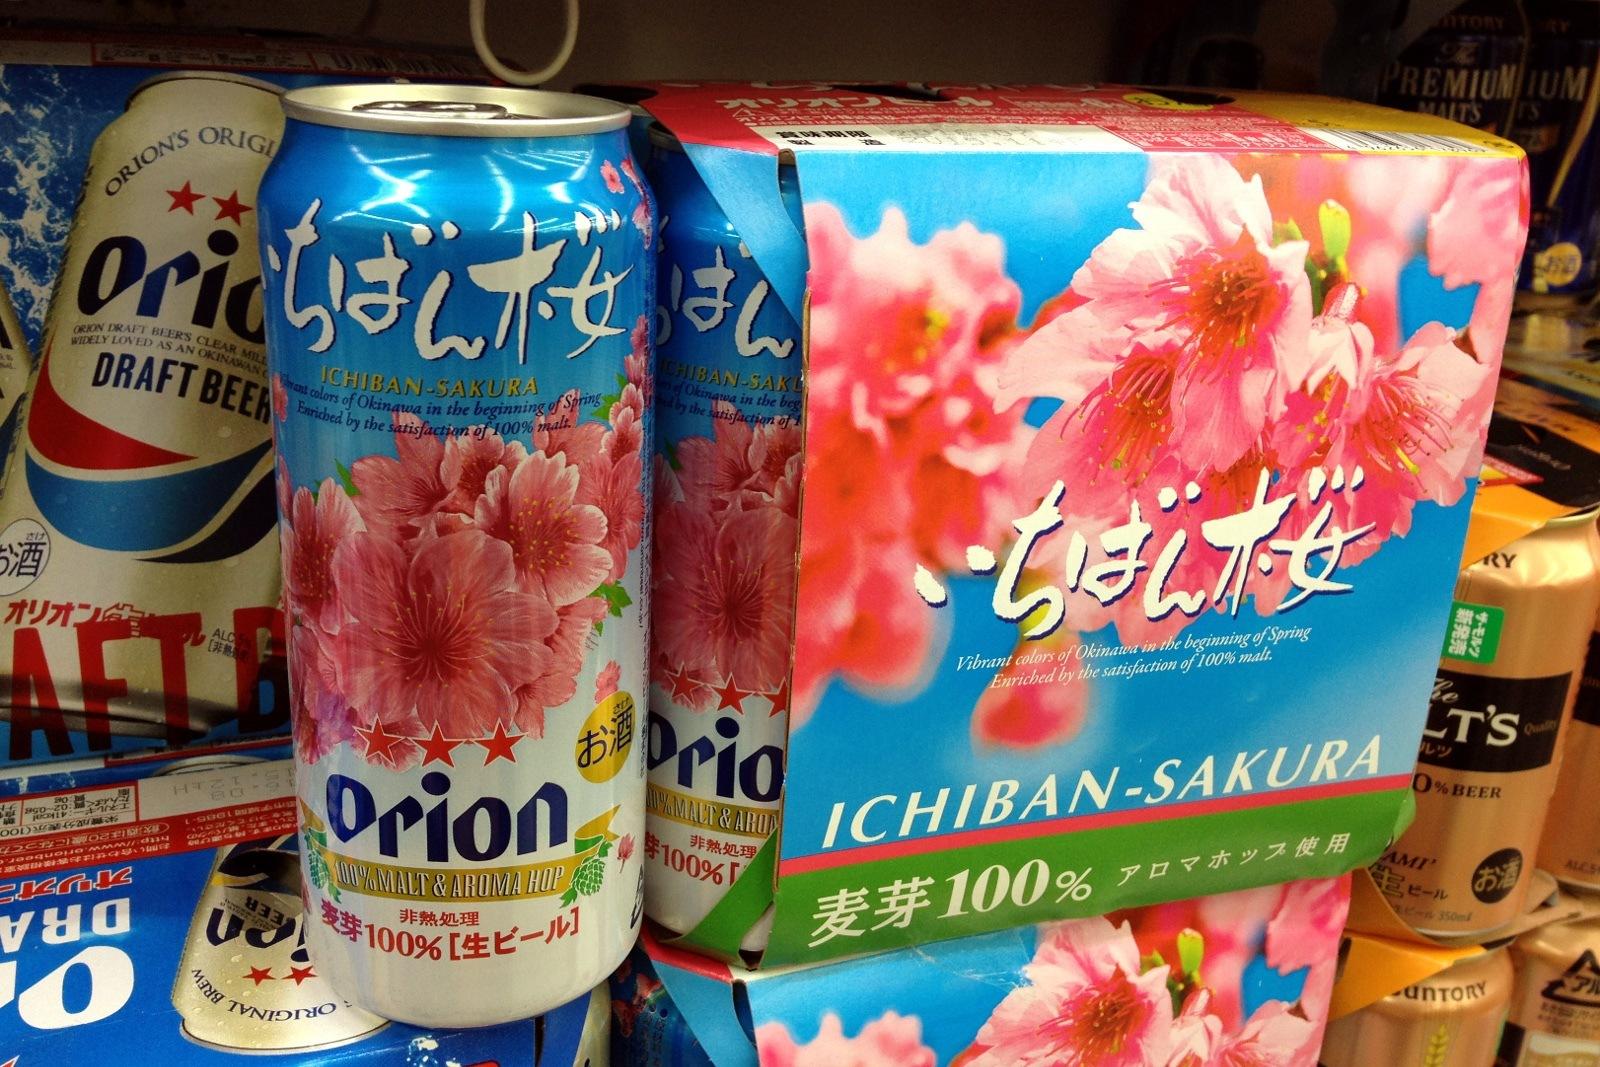 Japońskie przysłowia #16: sake nakute nan no onore ga sakura kana